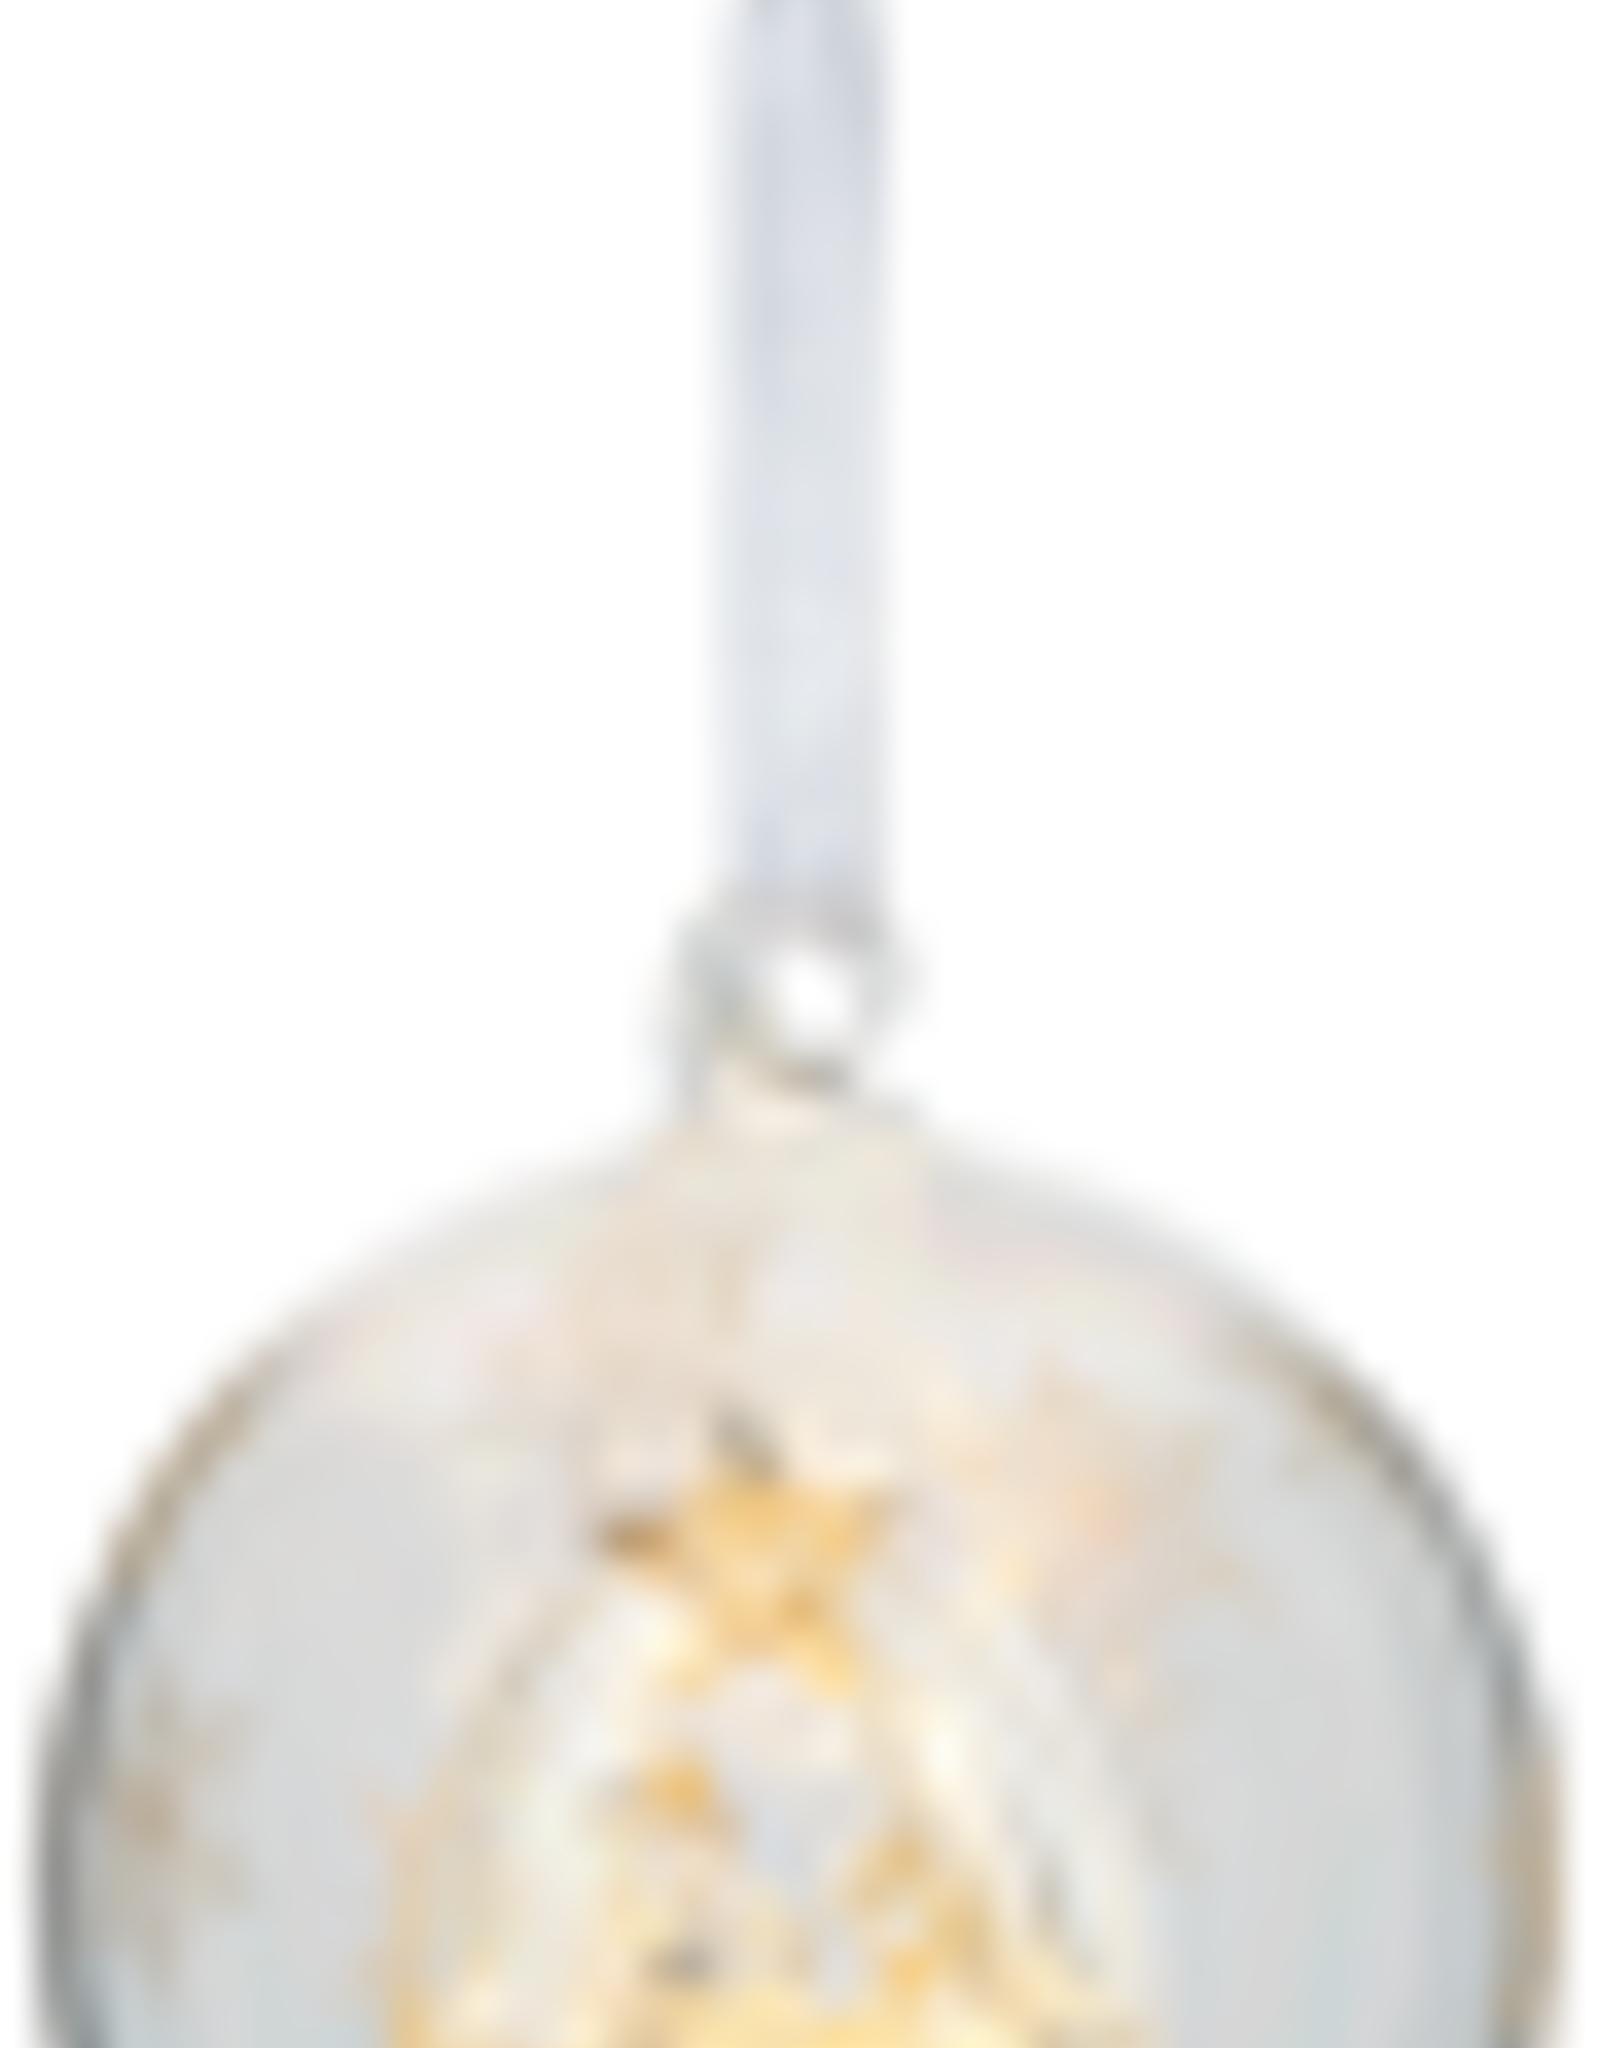 Midwest-CBK Light up Nativity Ornament